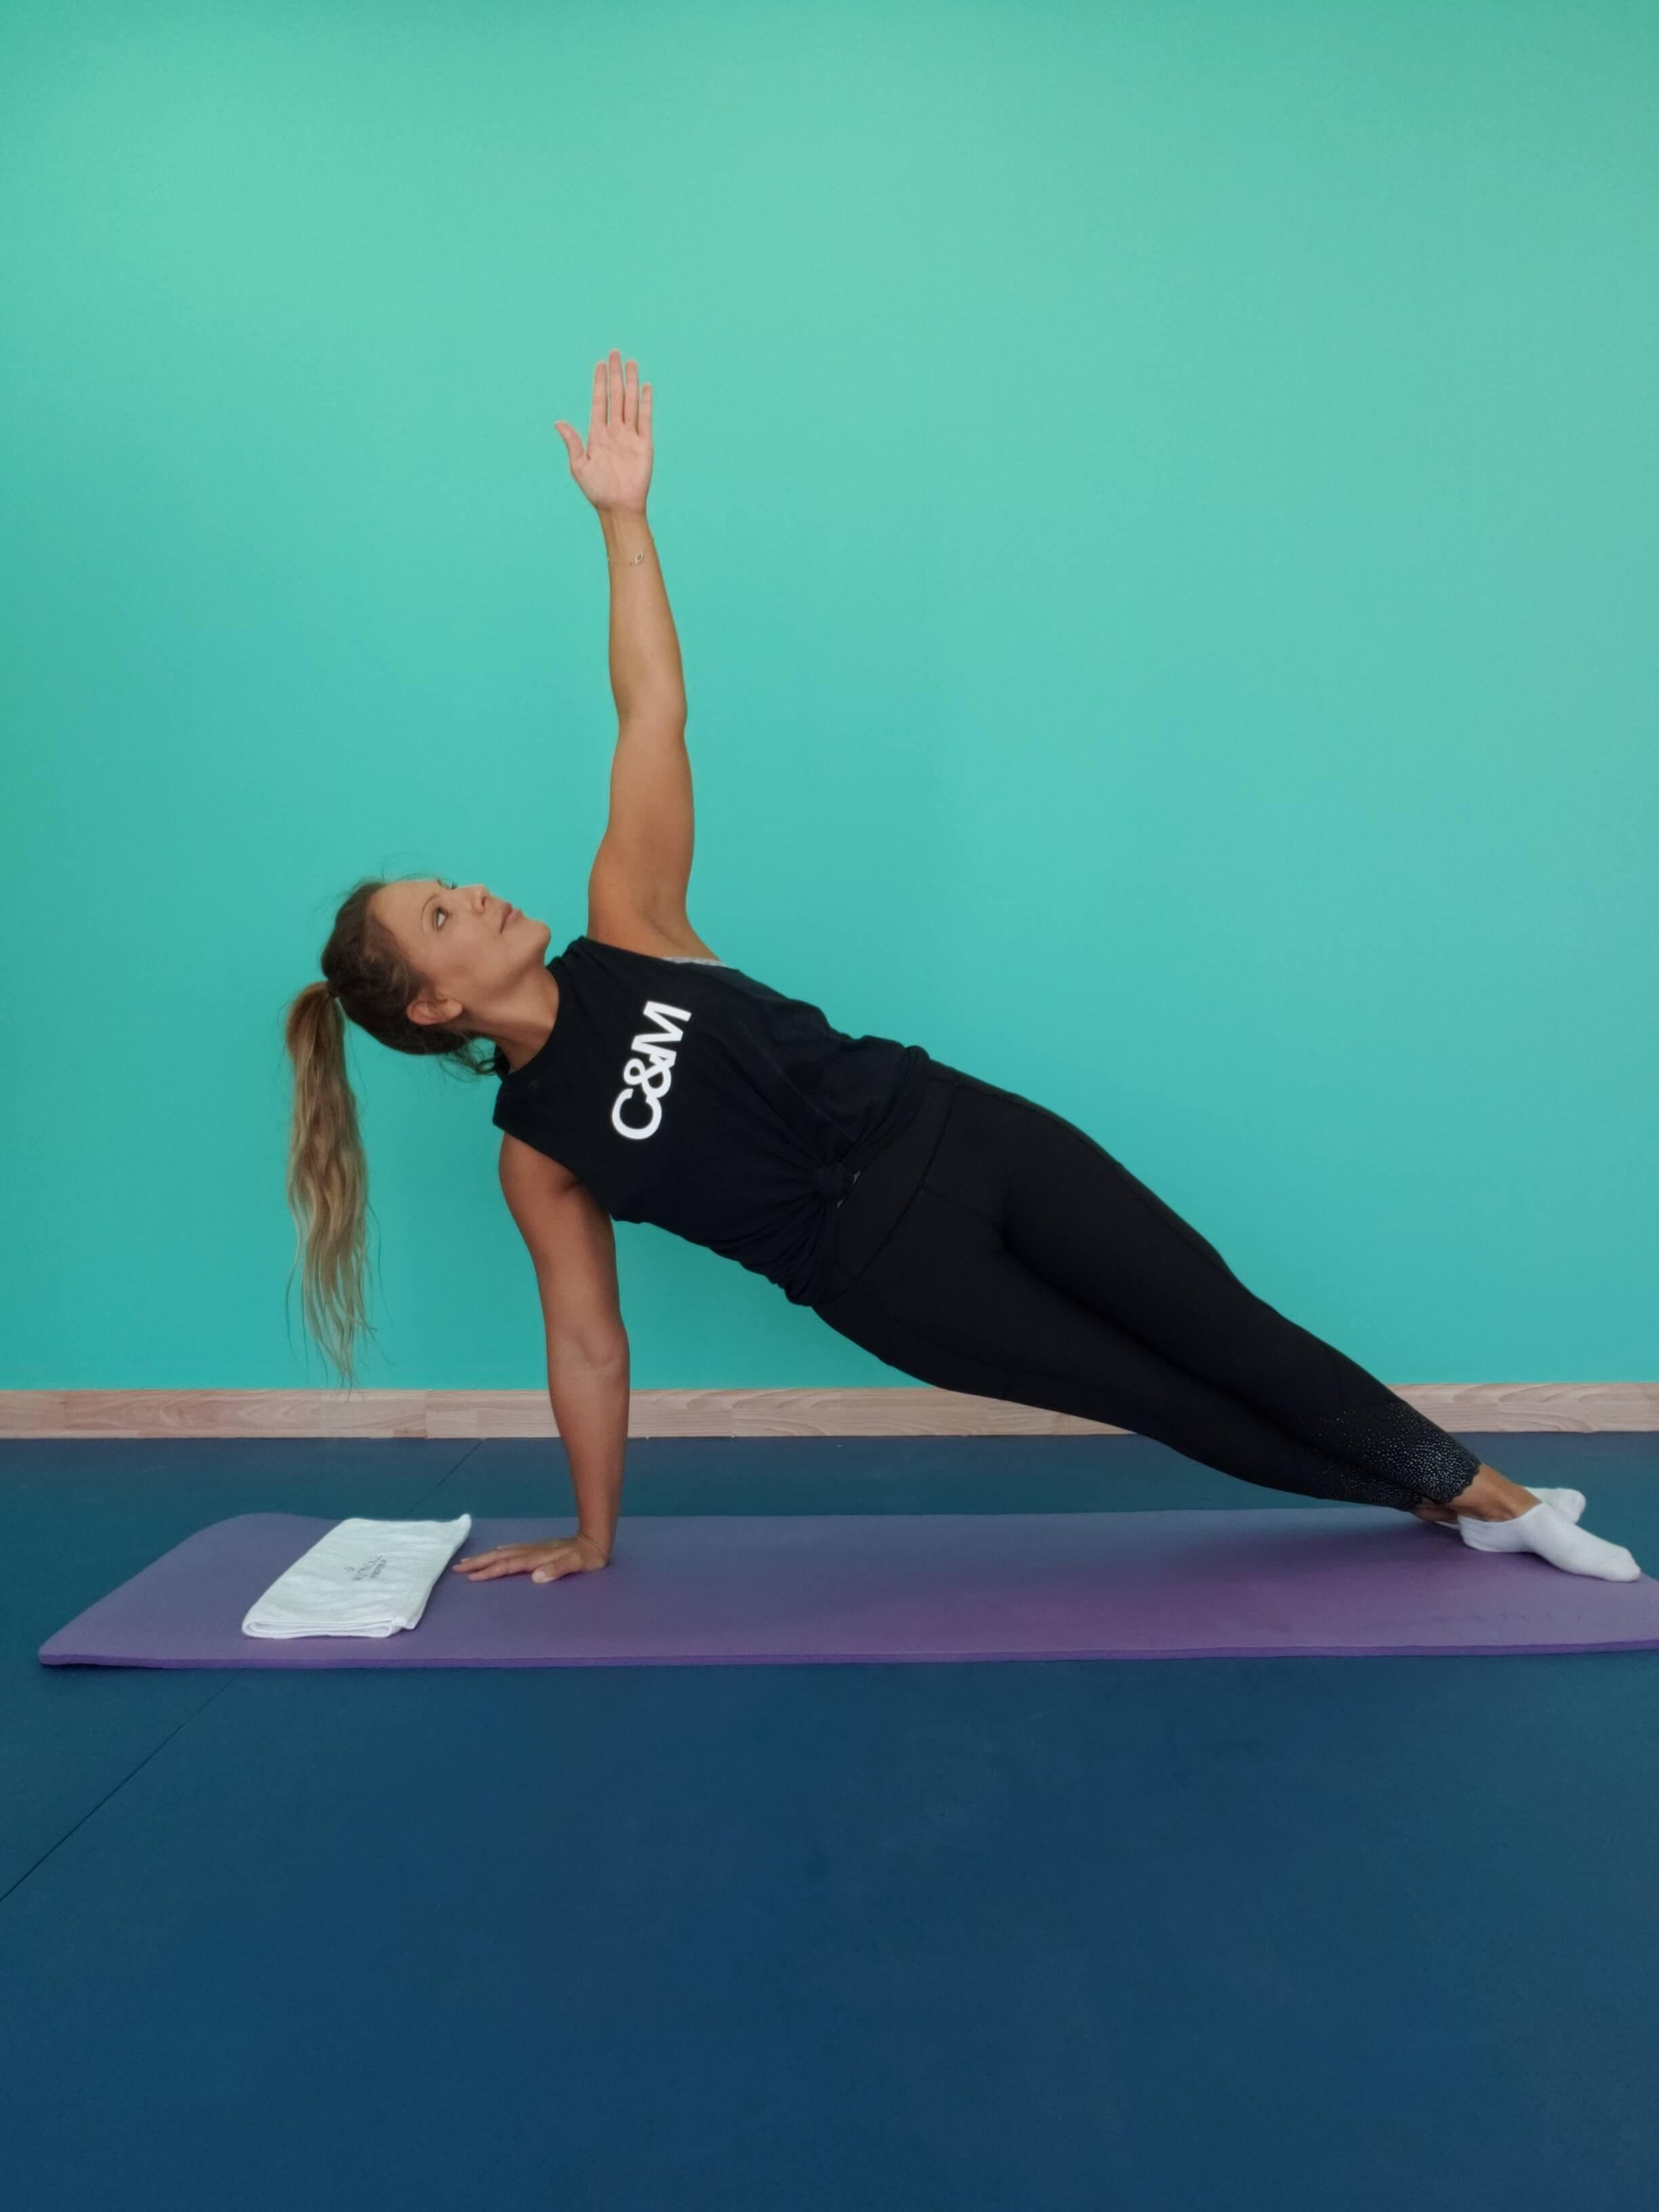 pilates-image-1